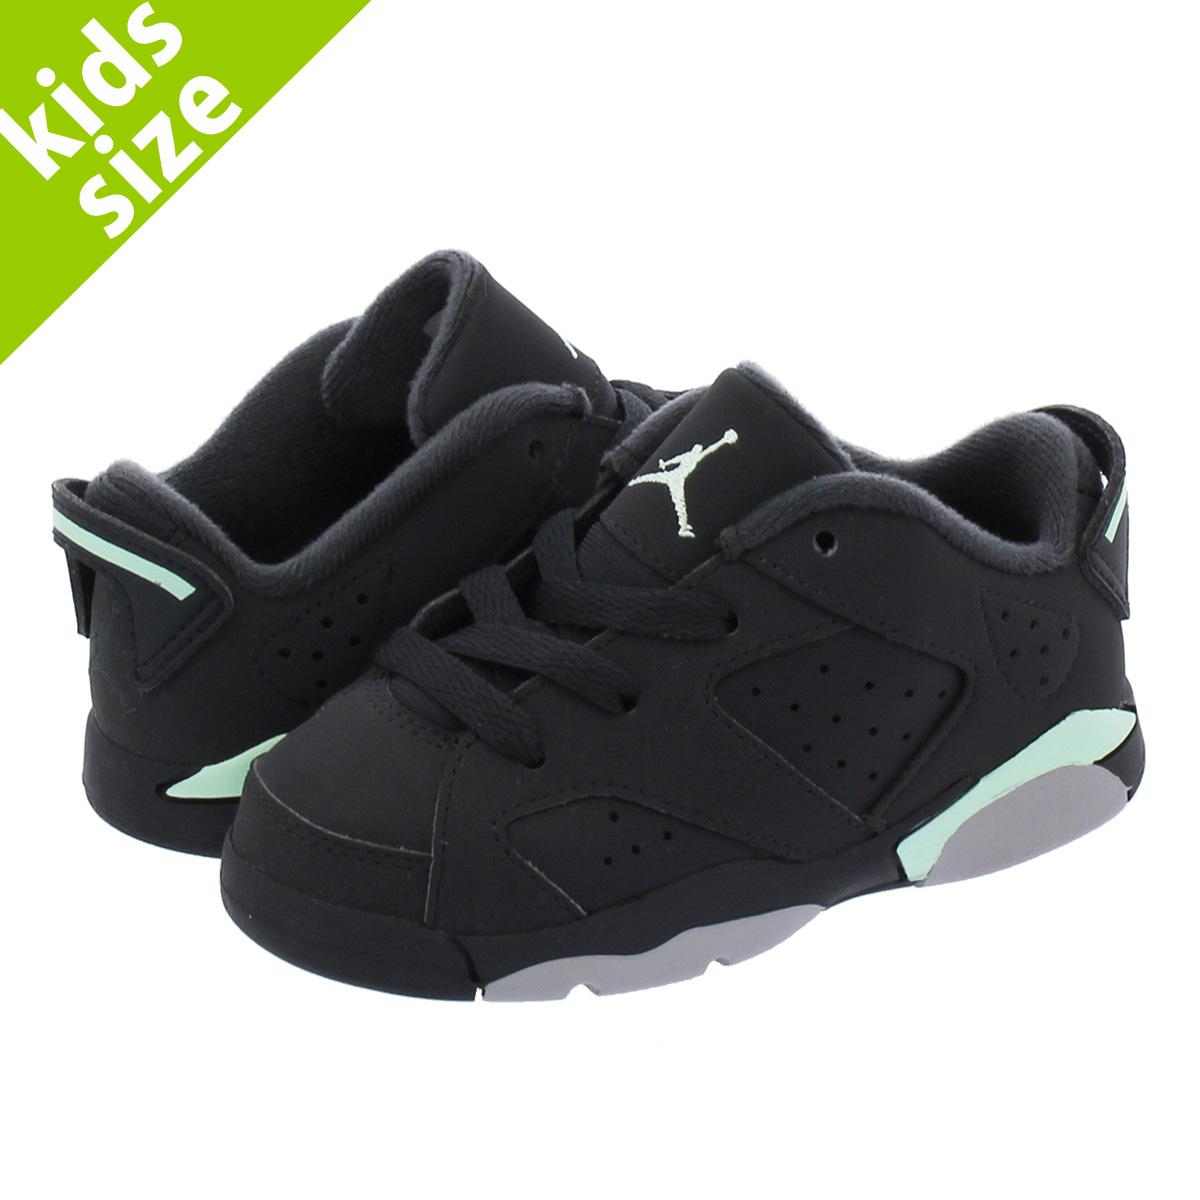 b42fe2a6399539 NIKE AIR JORDAN 6 RETRO LOW GT Nike Air Jordan 6 nostalgic low GT  ANTHRACITE MINT FOAM METALLIC GOLD 768